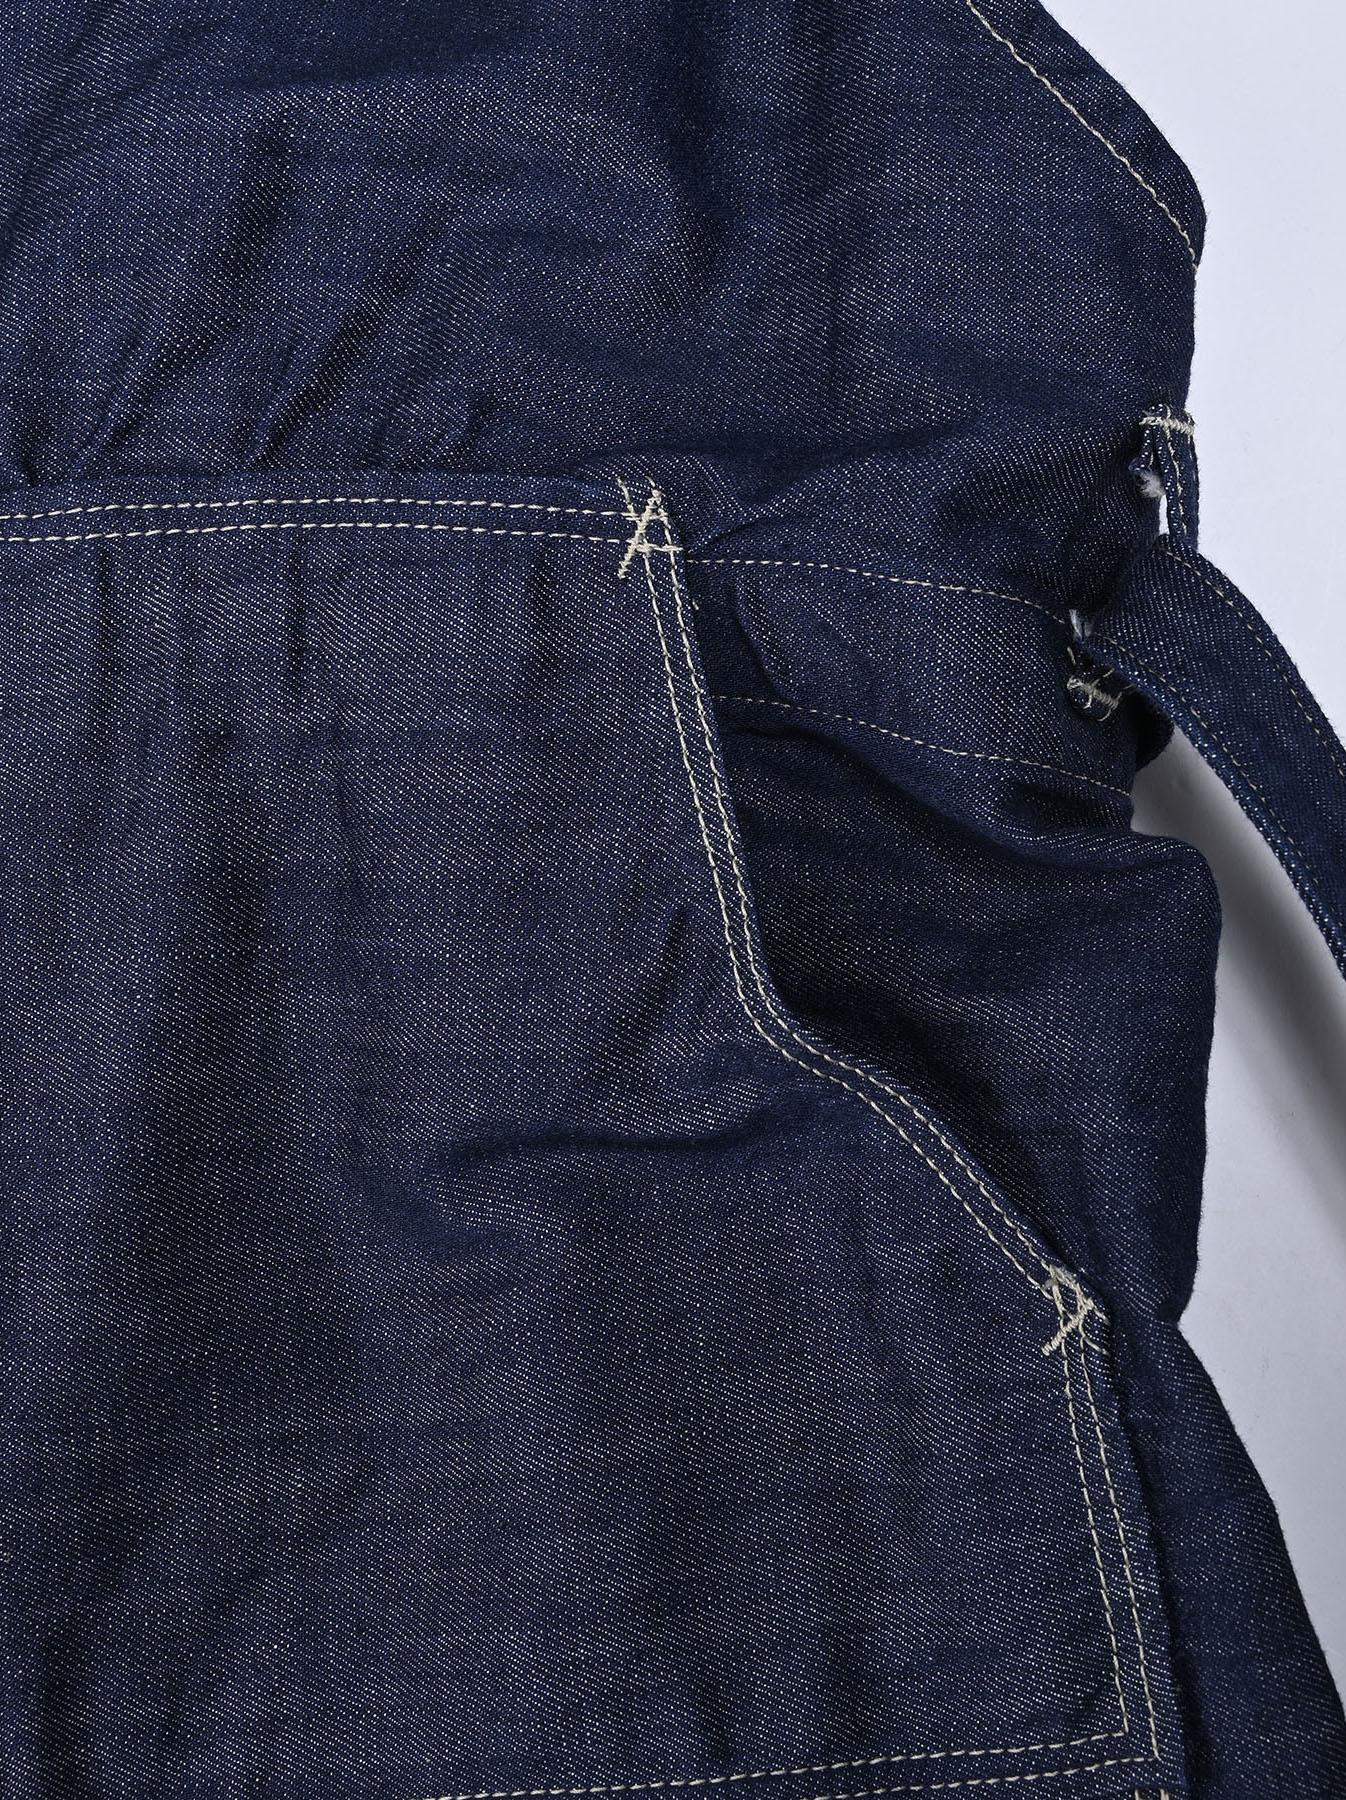 Monpu Apron Dress (0421)-12